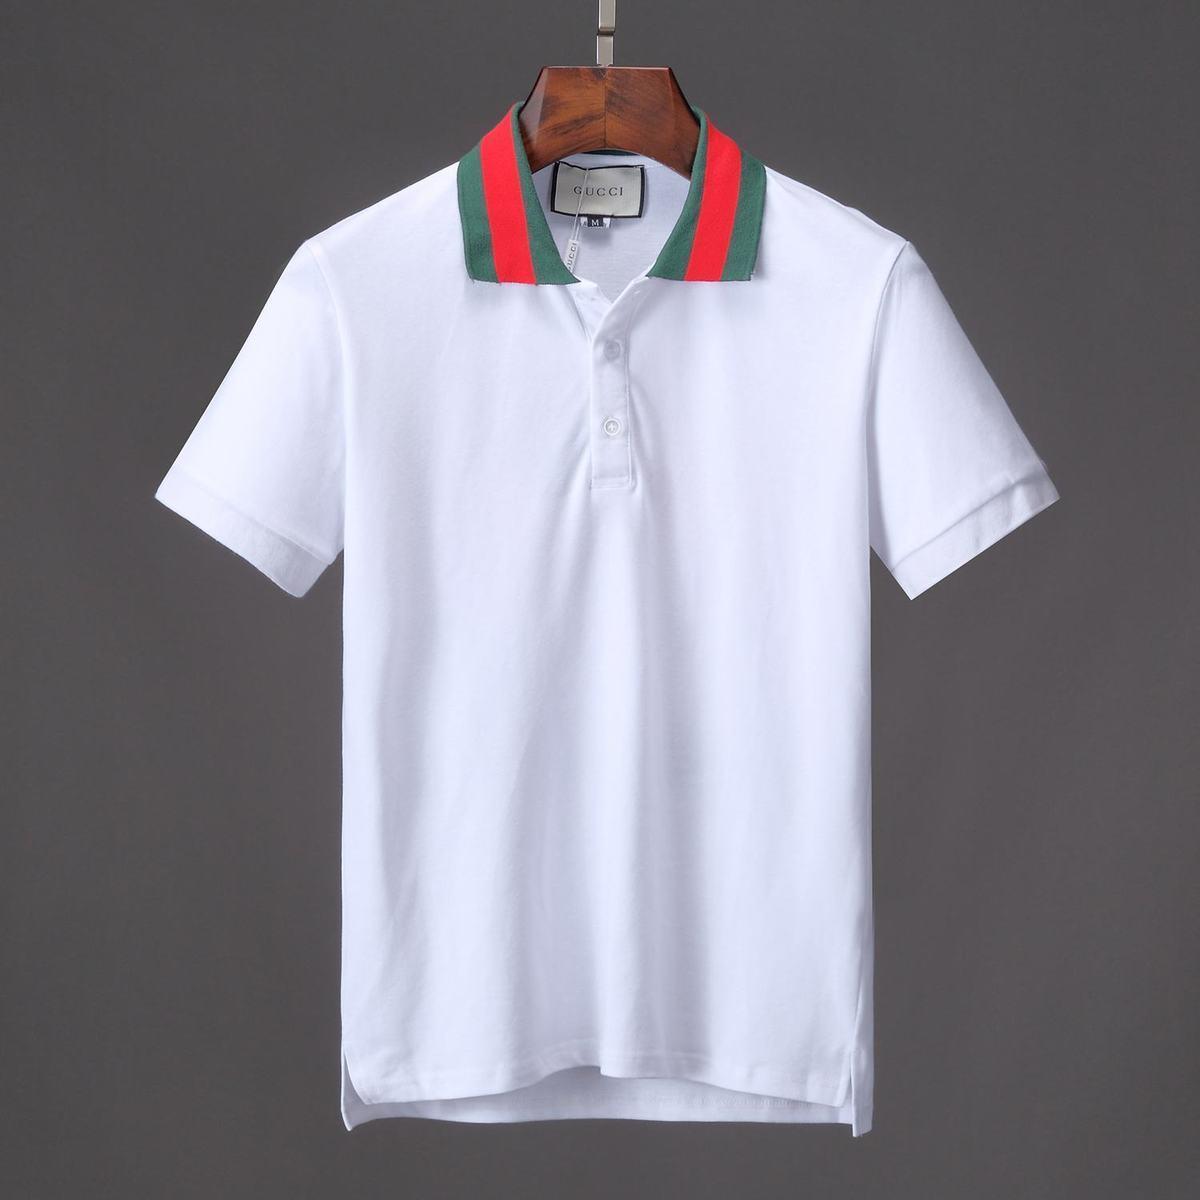 Gucci T Shirts Price In Pakistan